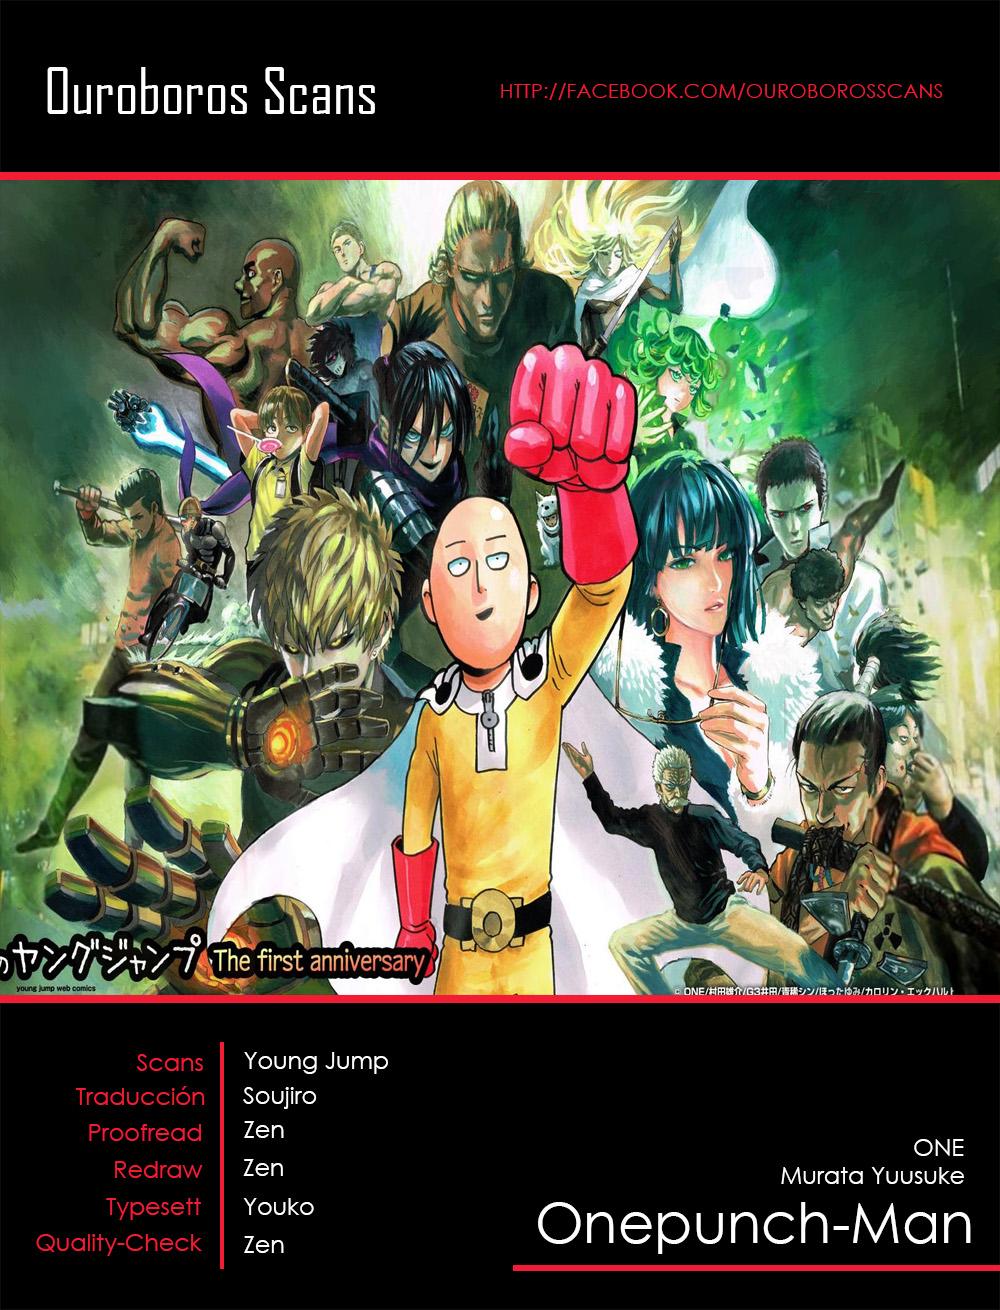 http://c5.ninemanga.com/es_manga/21/14805/389506/f53cfee8ec535cd60167044b316bc5cd.jpg Page 1